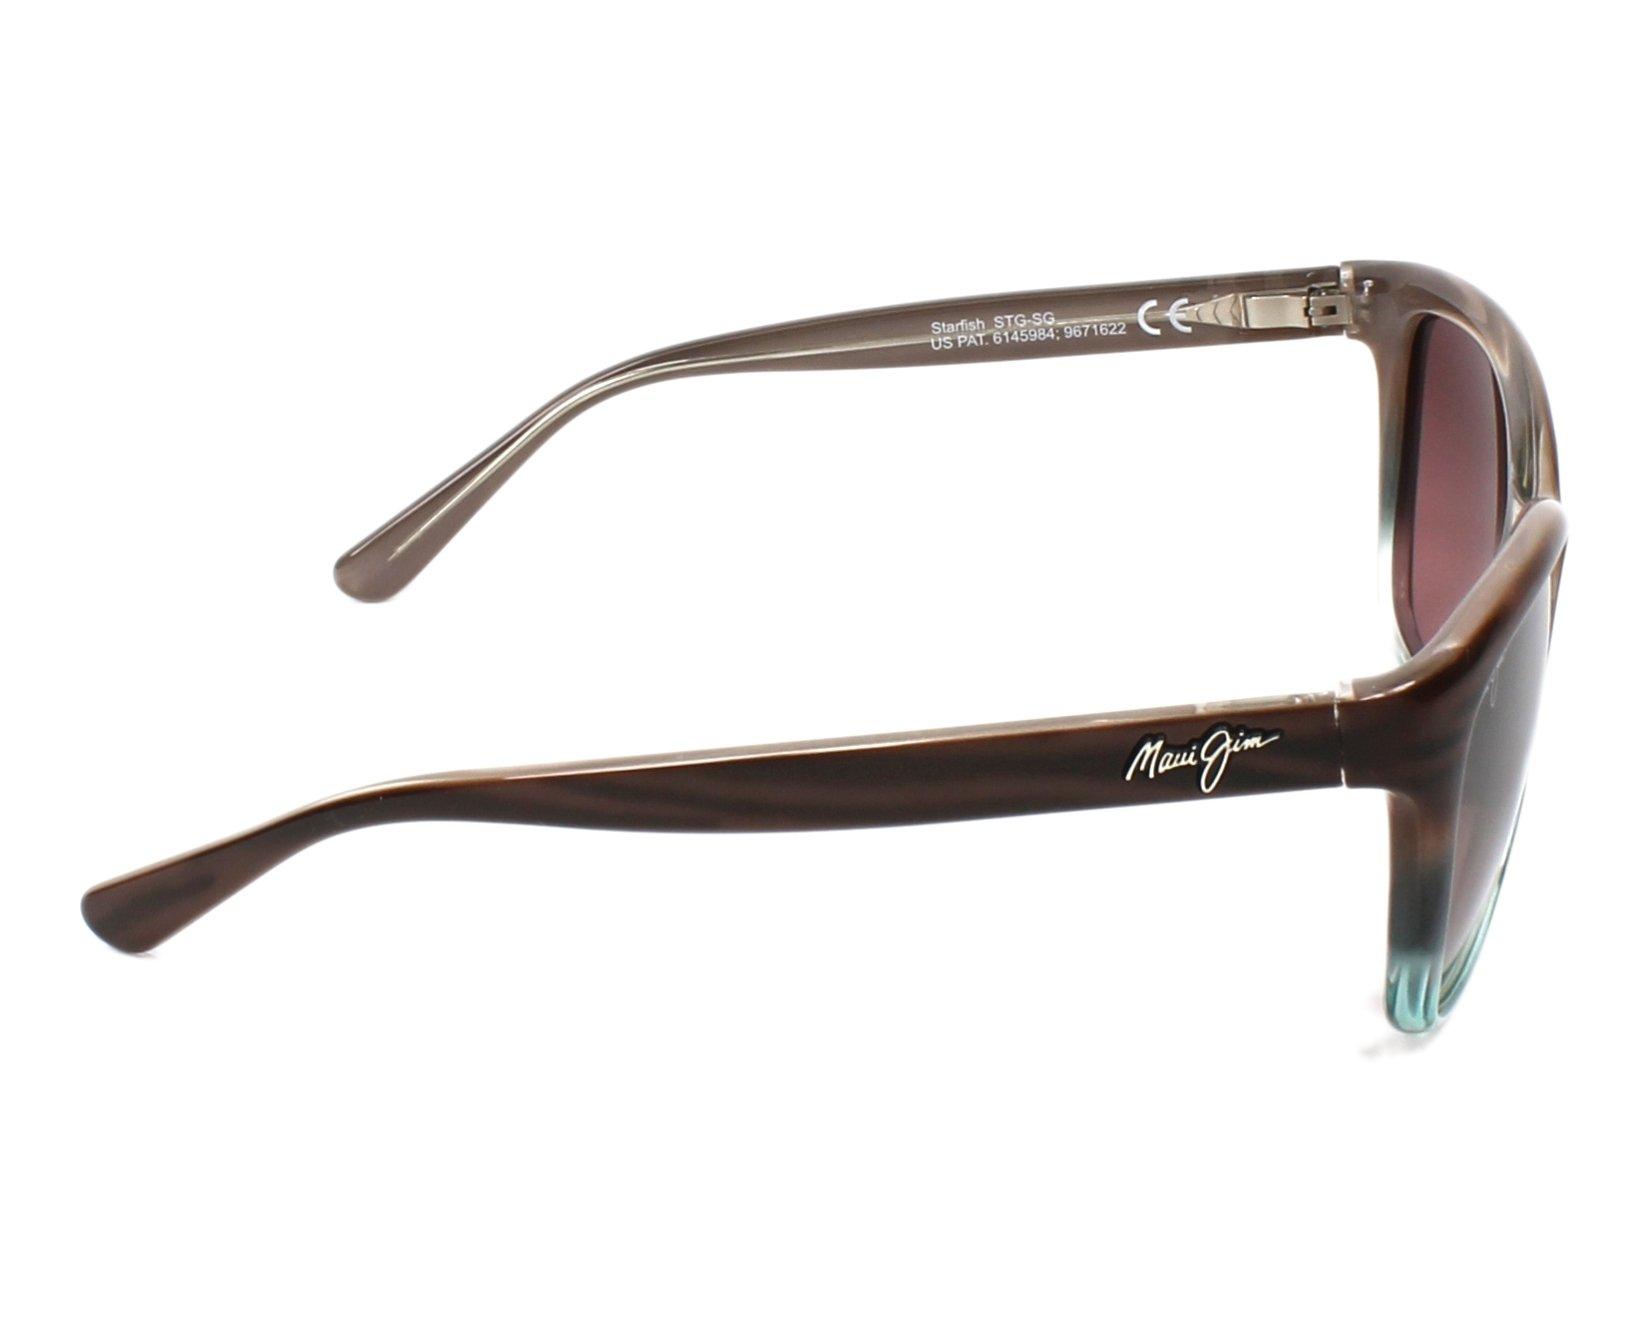 e784d199a9bae Sunglasses Maui Jim RS-744 22B - Brown Turquoise side view